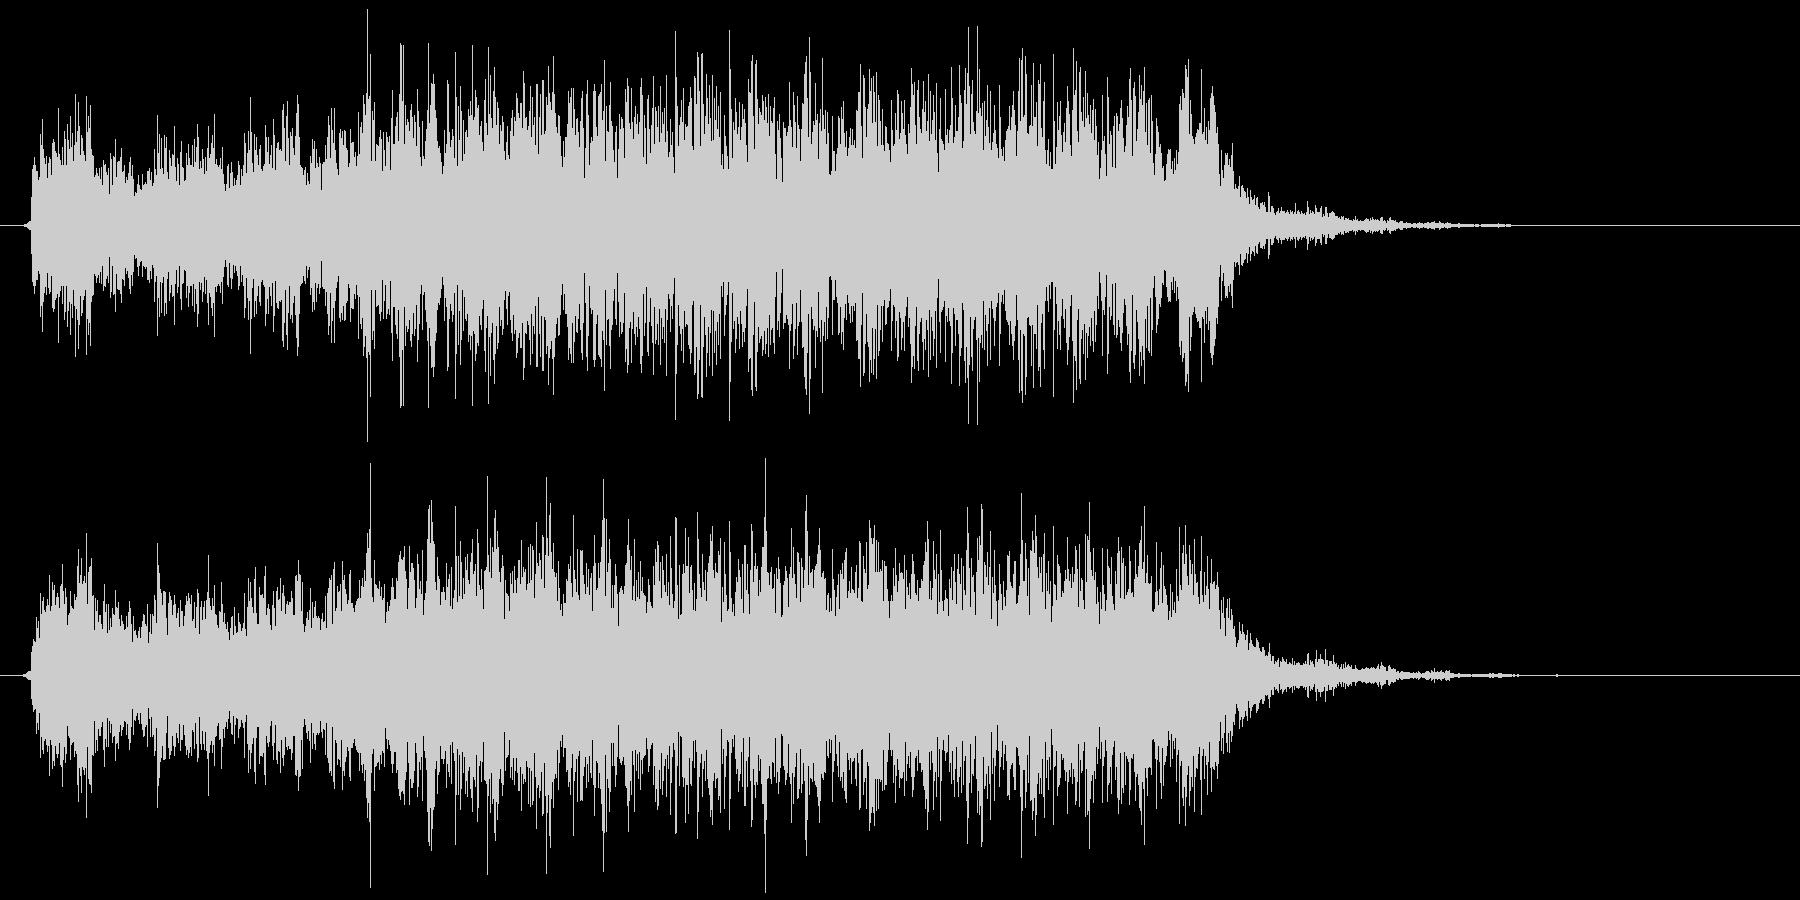 CDドライブ 読み込み(キュルル…キッ)の未再生の波形